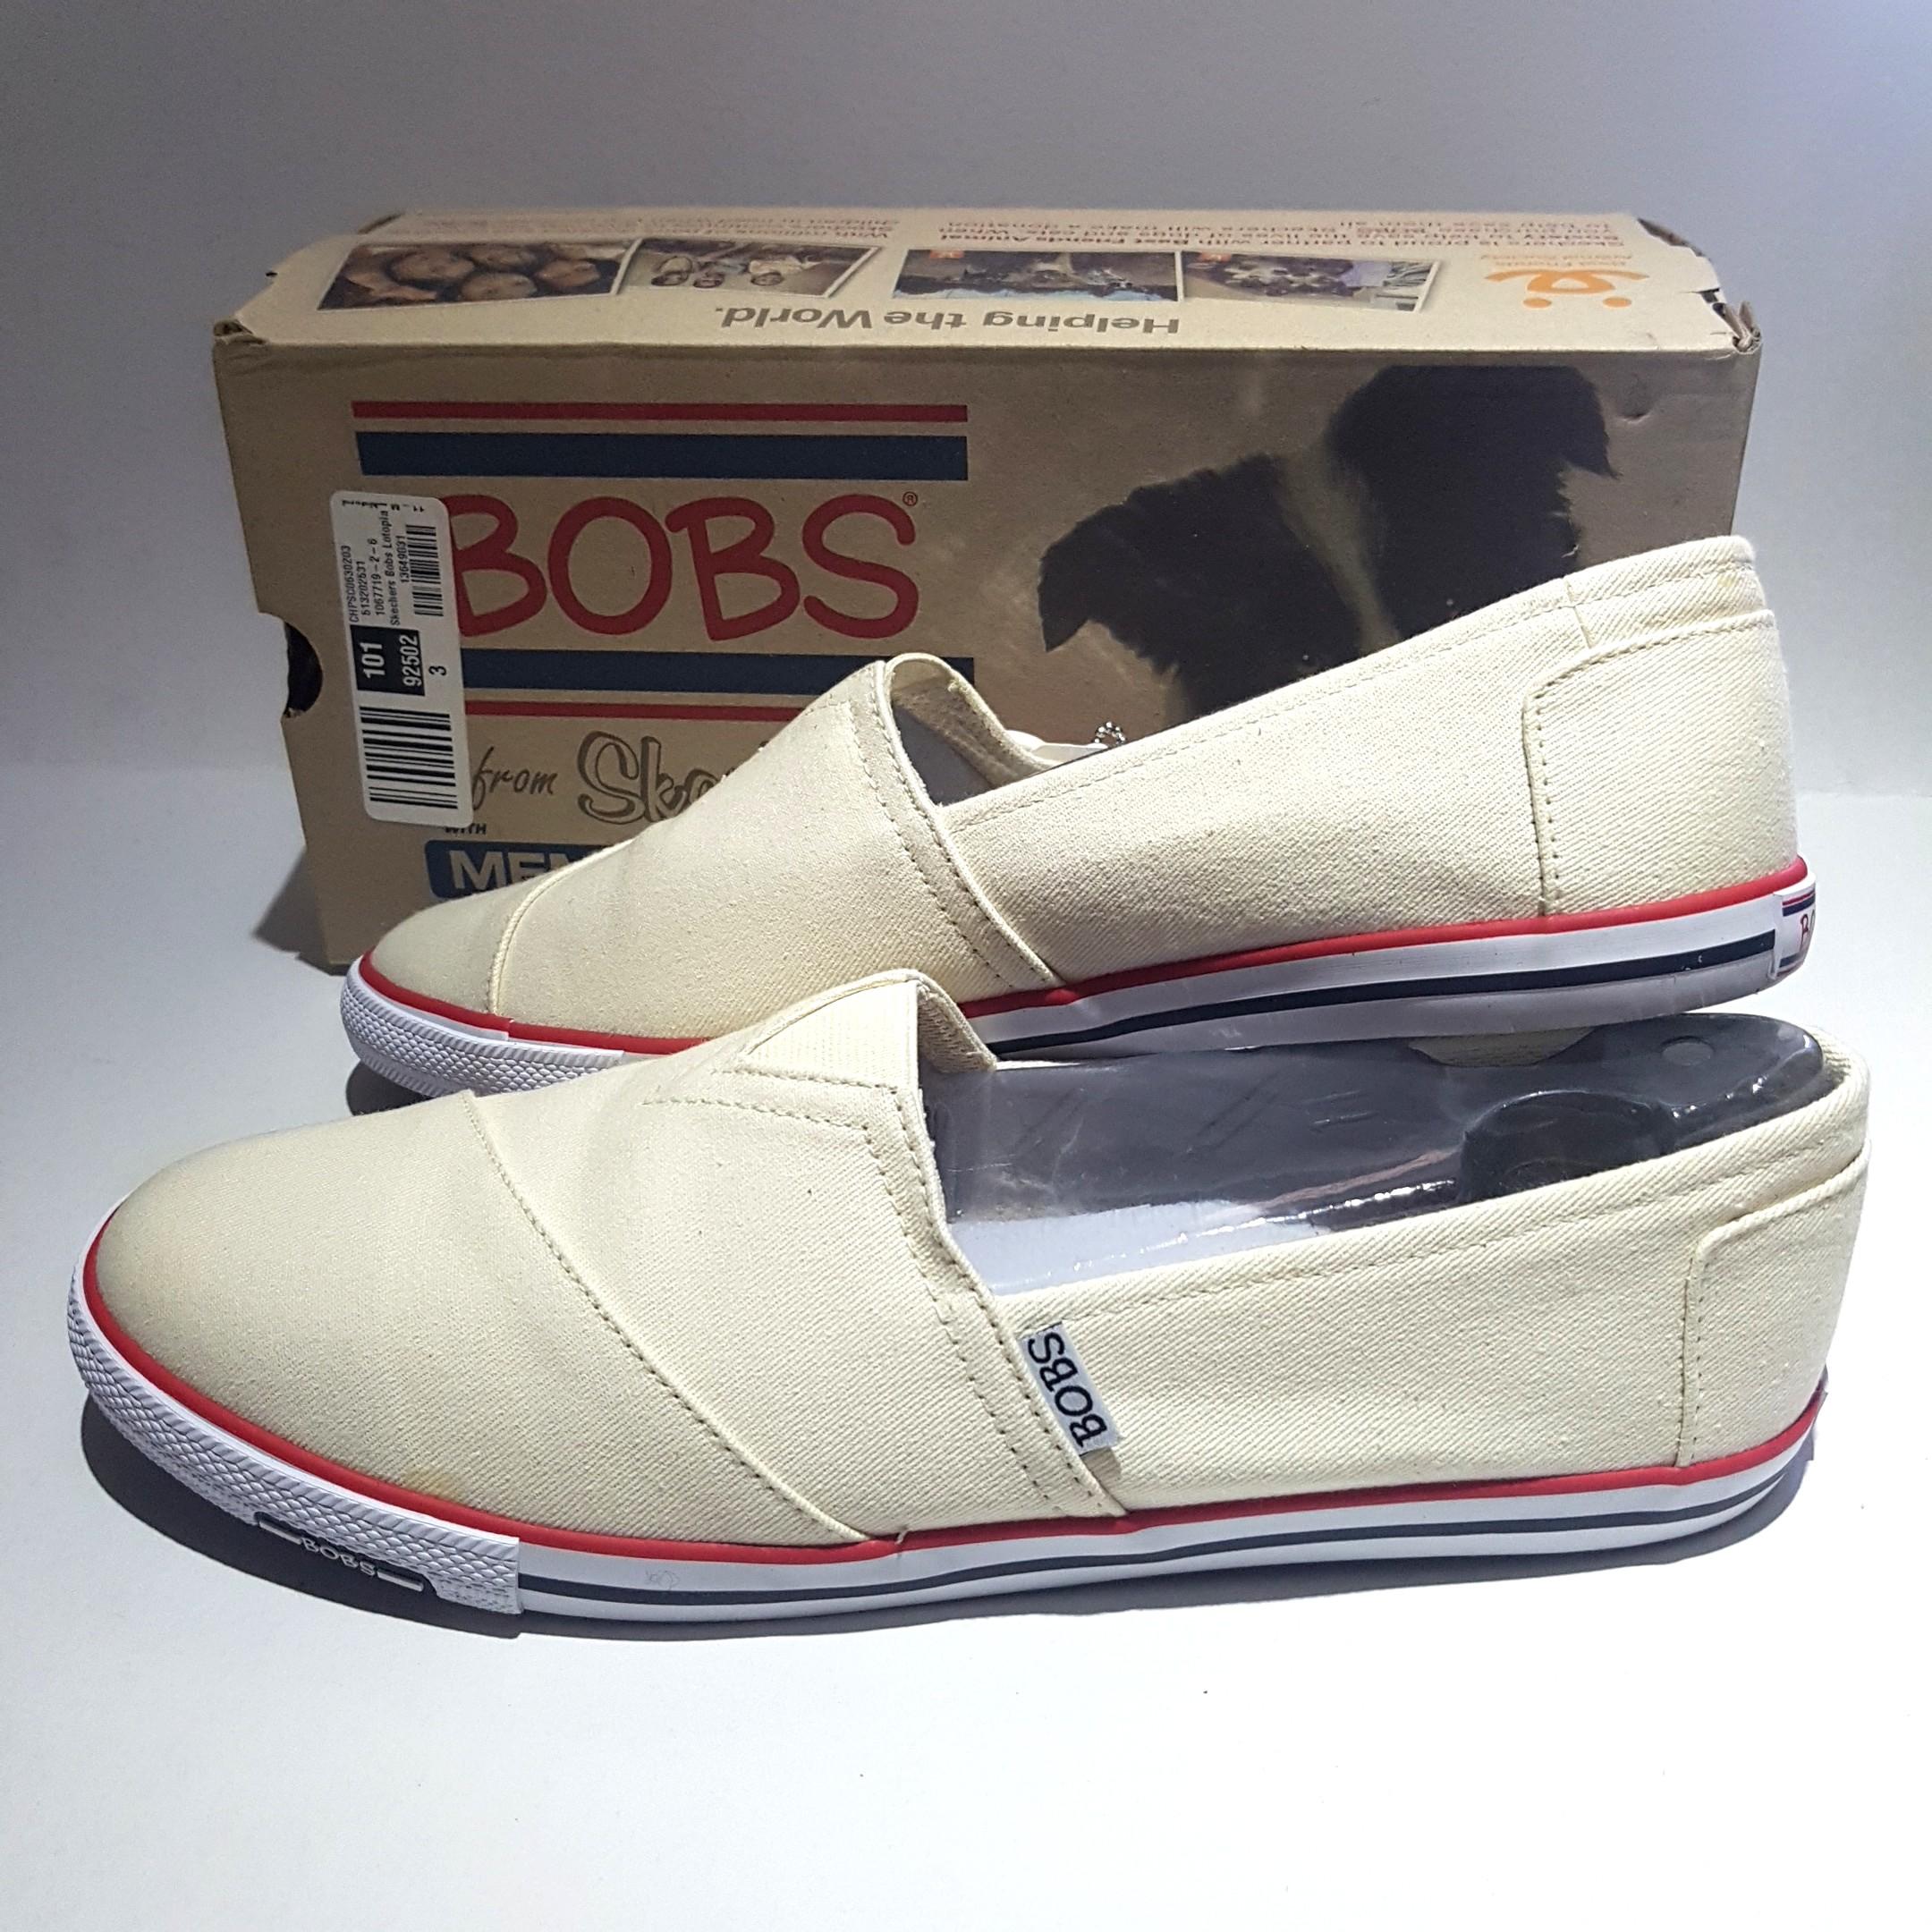 47c1e2fdd73 Skechers BOBS Lotopia Pleasantville Natural slip on shoes sz 11 ...